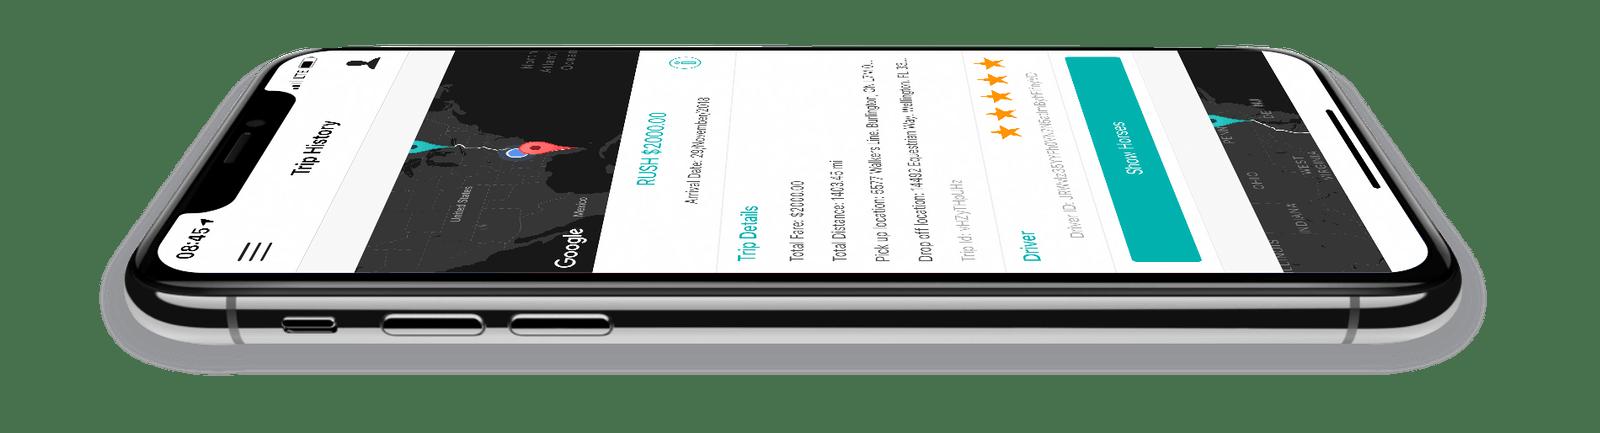 hor-phone-p-1600-1